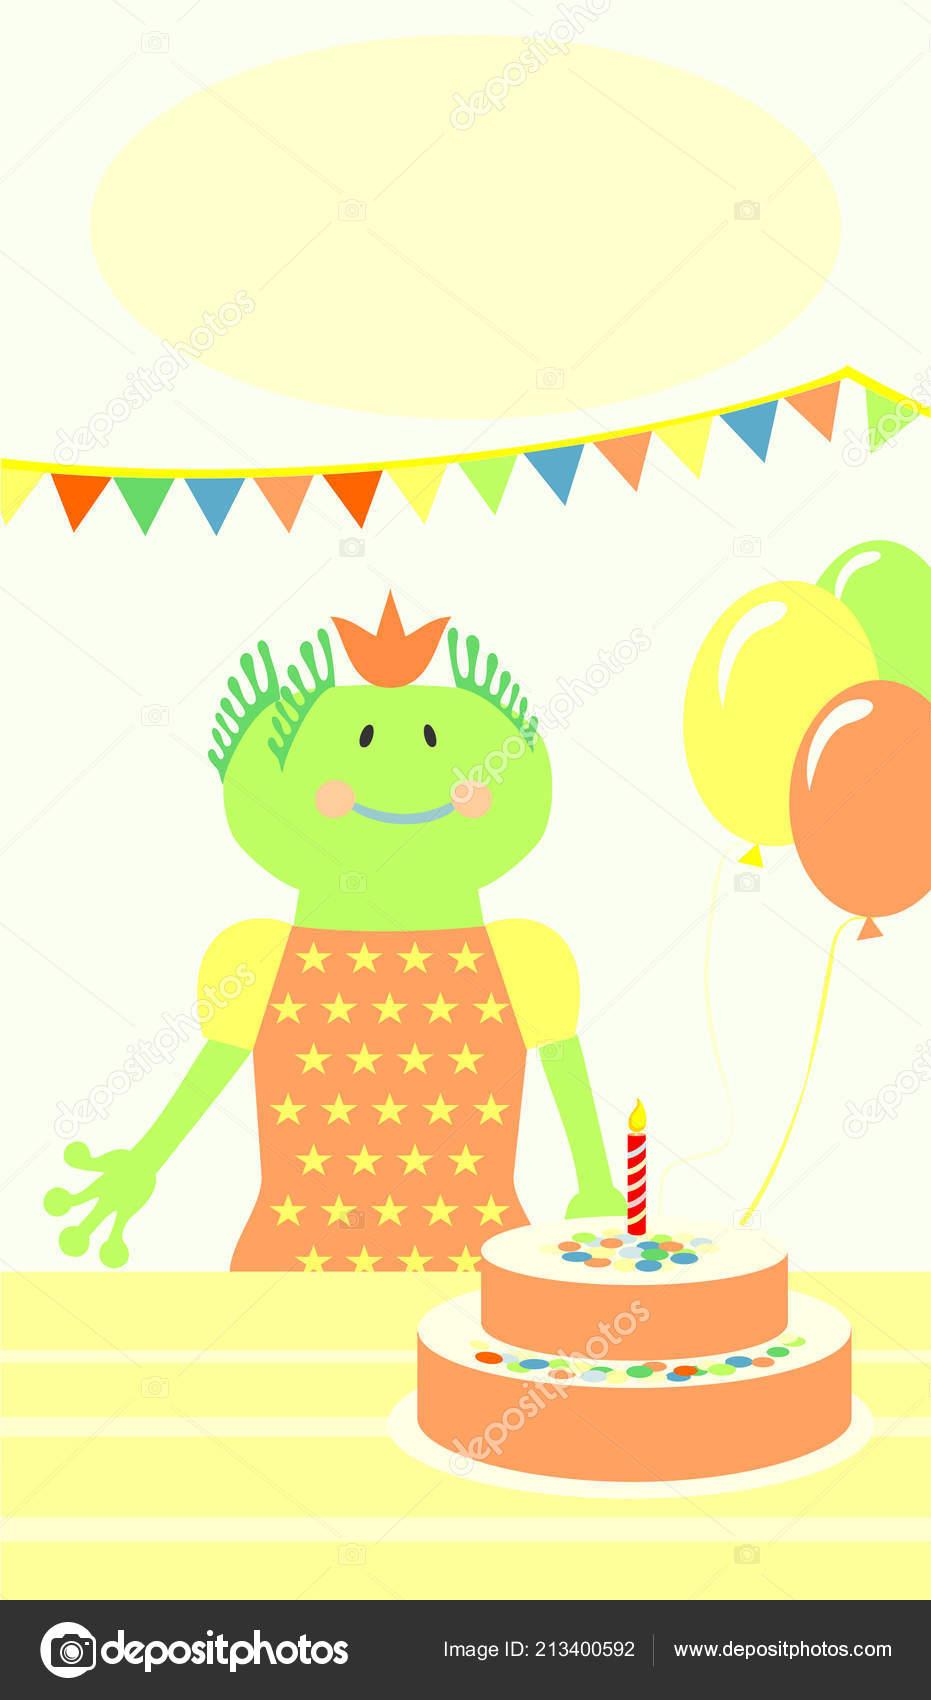 Outstanding Smiling Green Alien Birthday Cake Stock Vector C Junejuly 213400592 Funny Birthday Cards Online Elaedamsfinfo